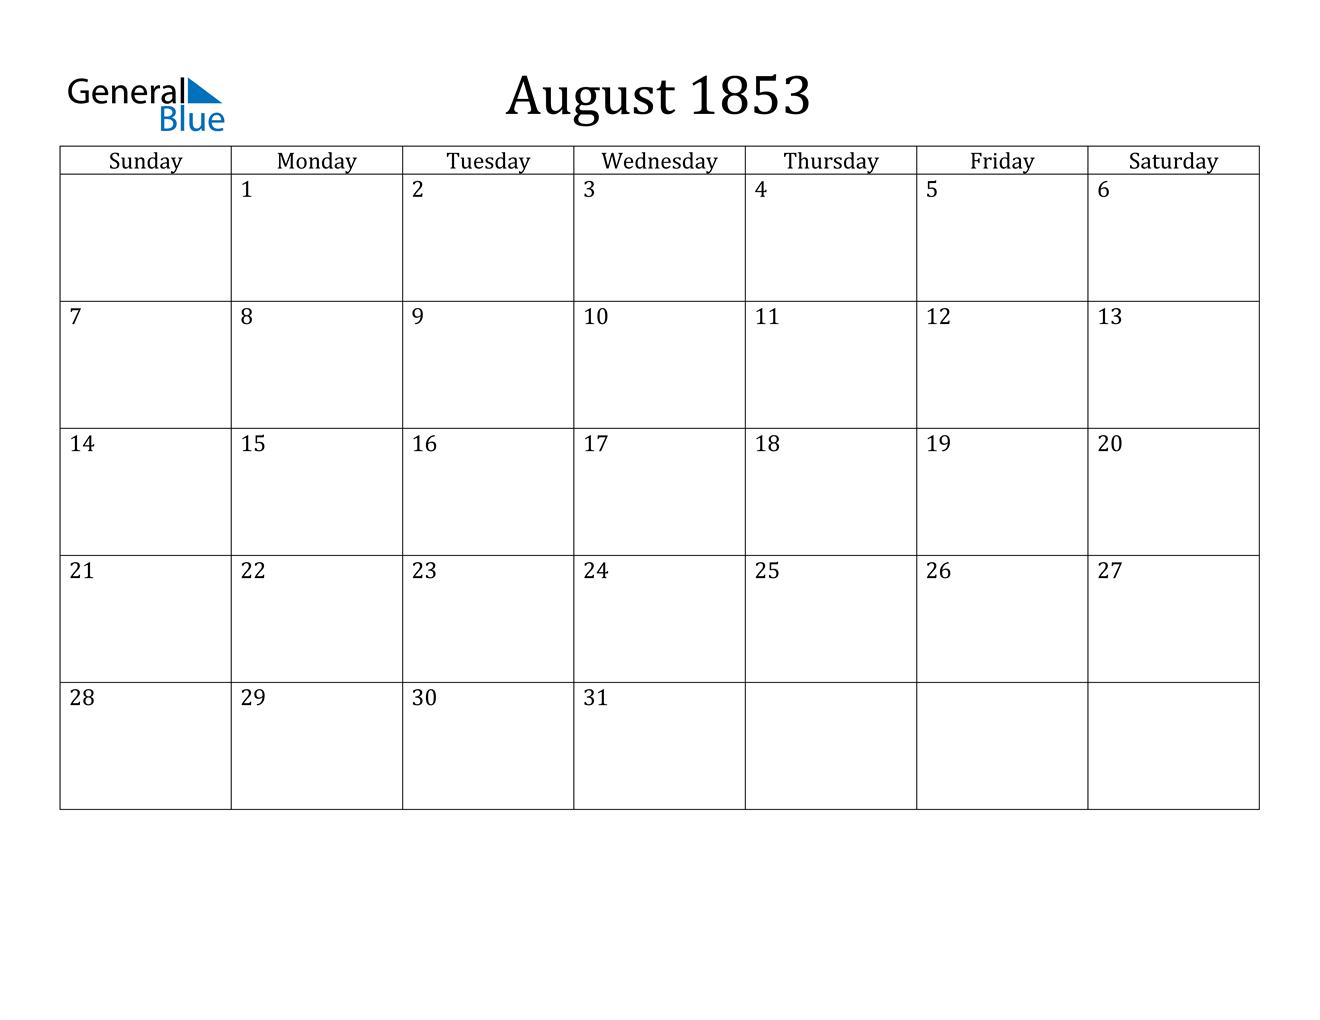 Image of August 1853 Calendar